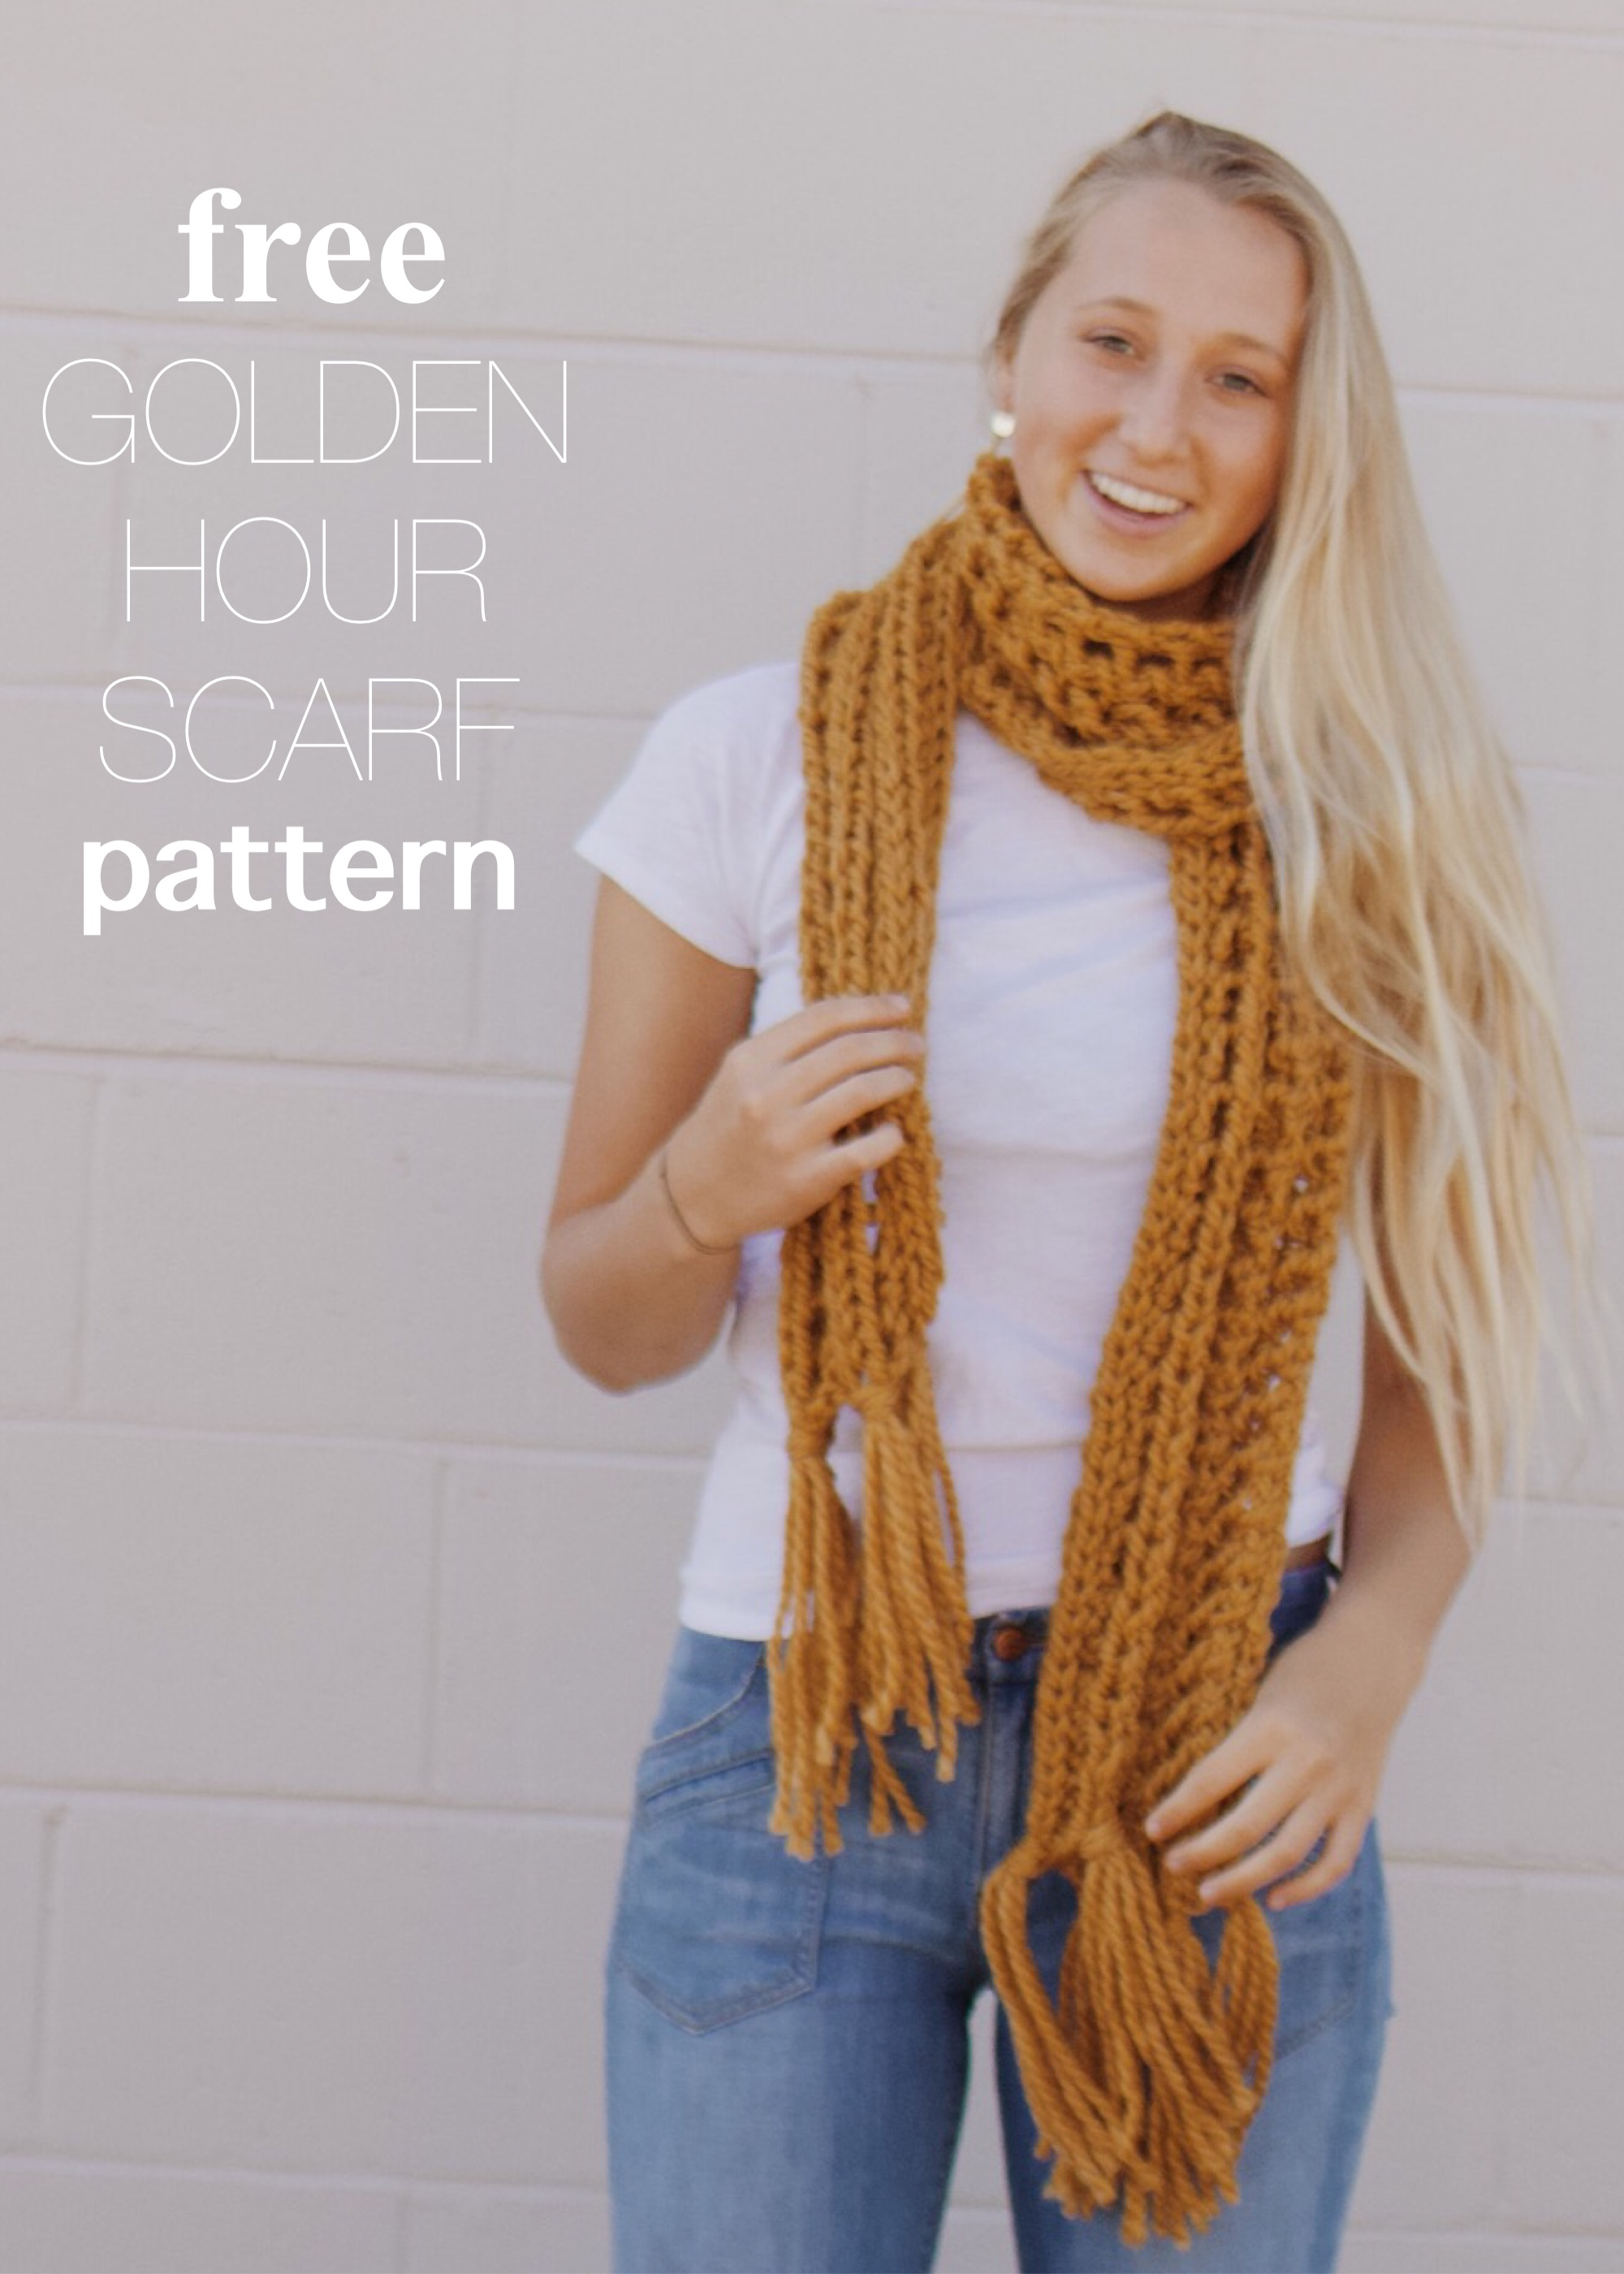 Free knit scarf pattern by Bluecorduroy.com